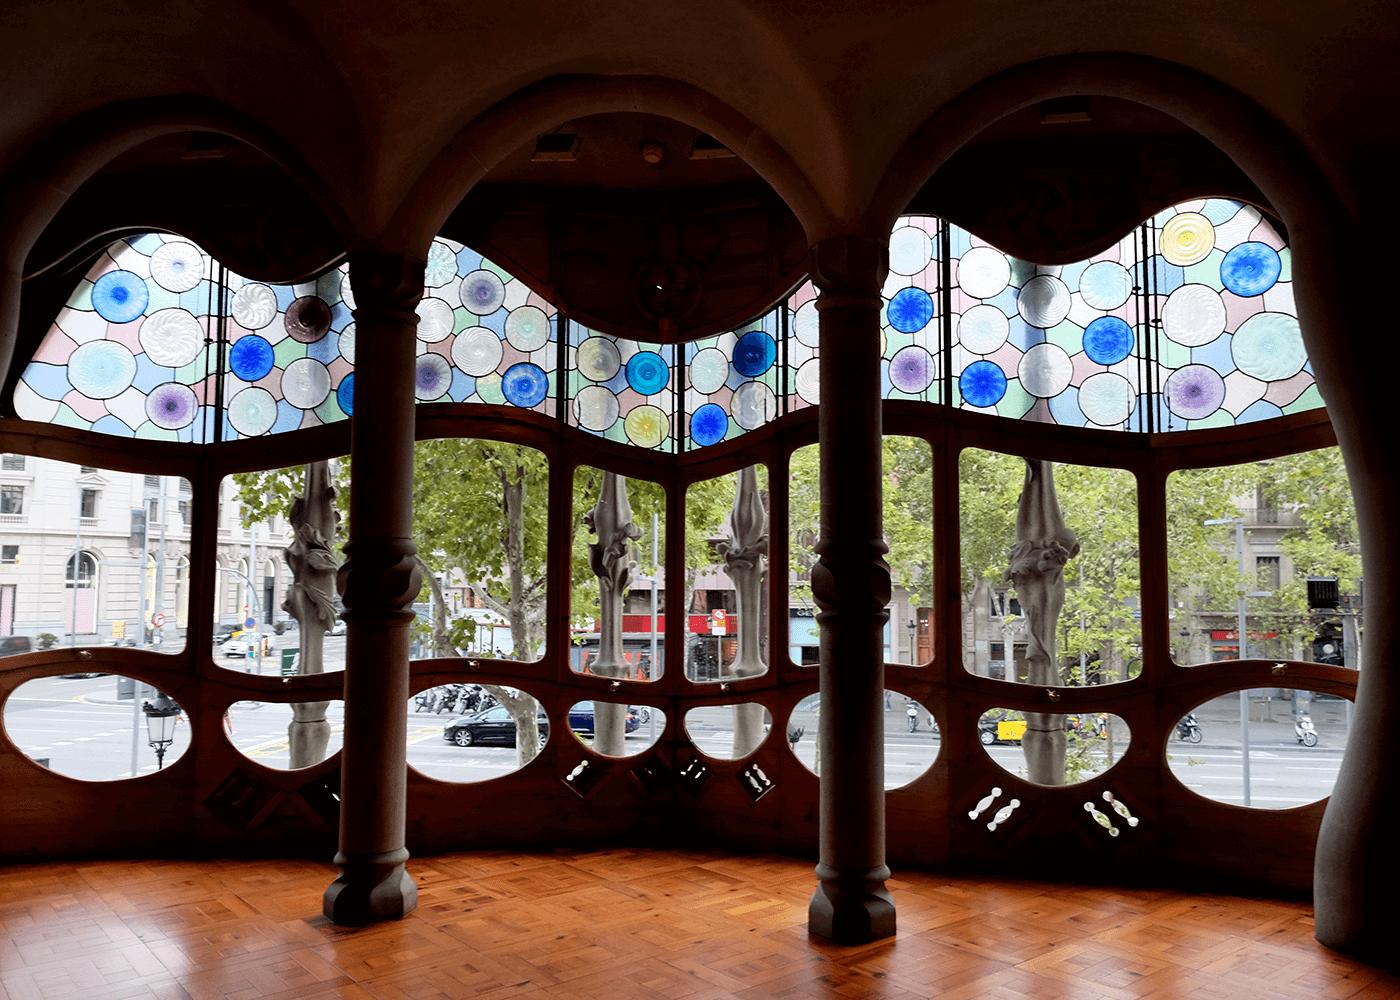 Casa Batlló(カサバトリョ)